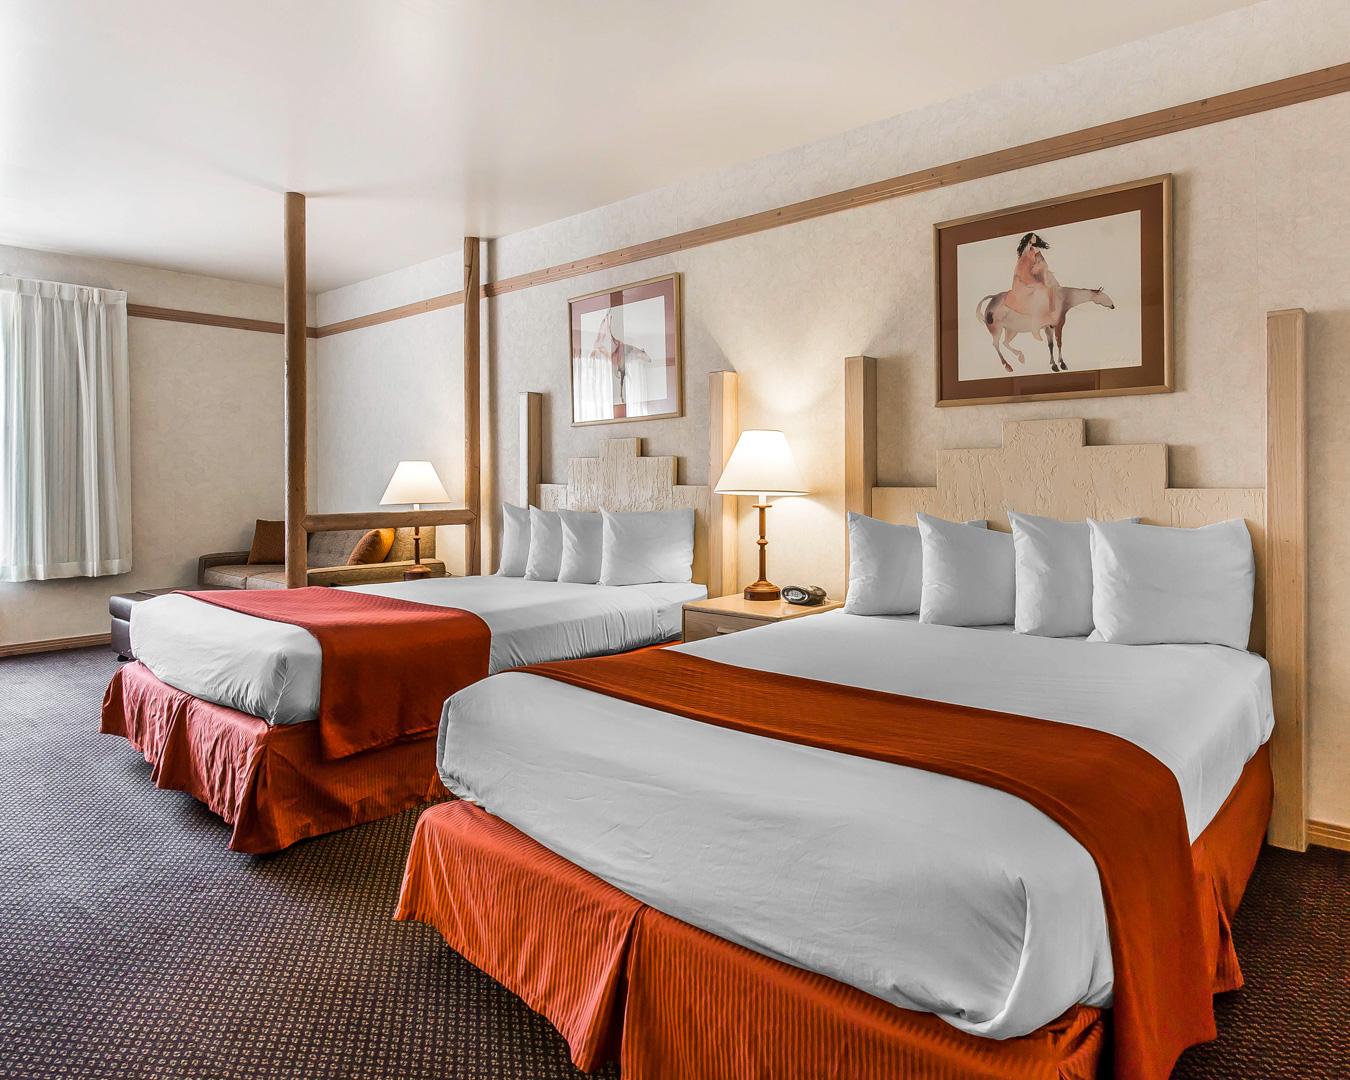 Quality Suites, Moab UT